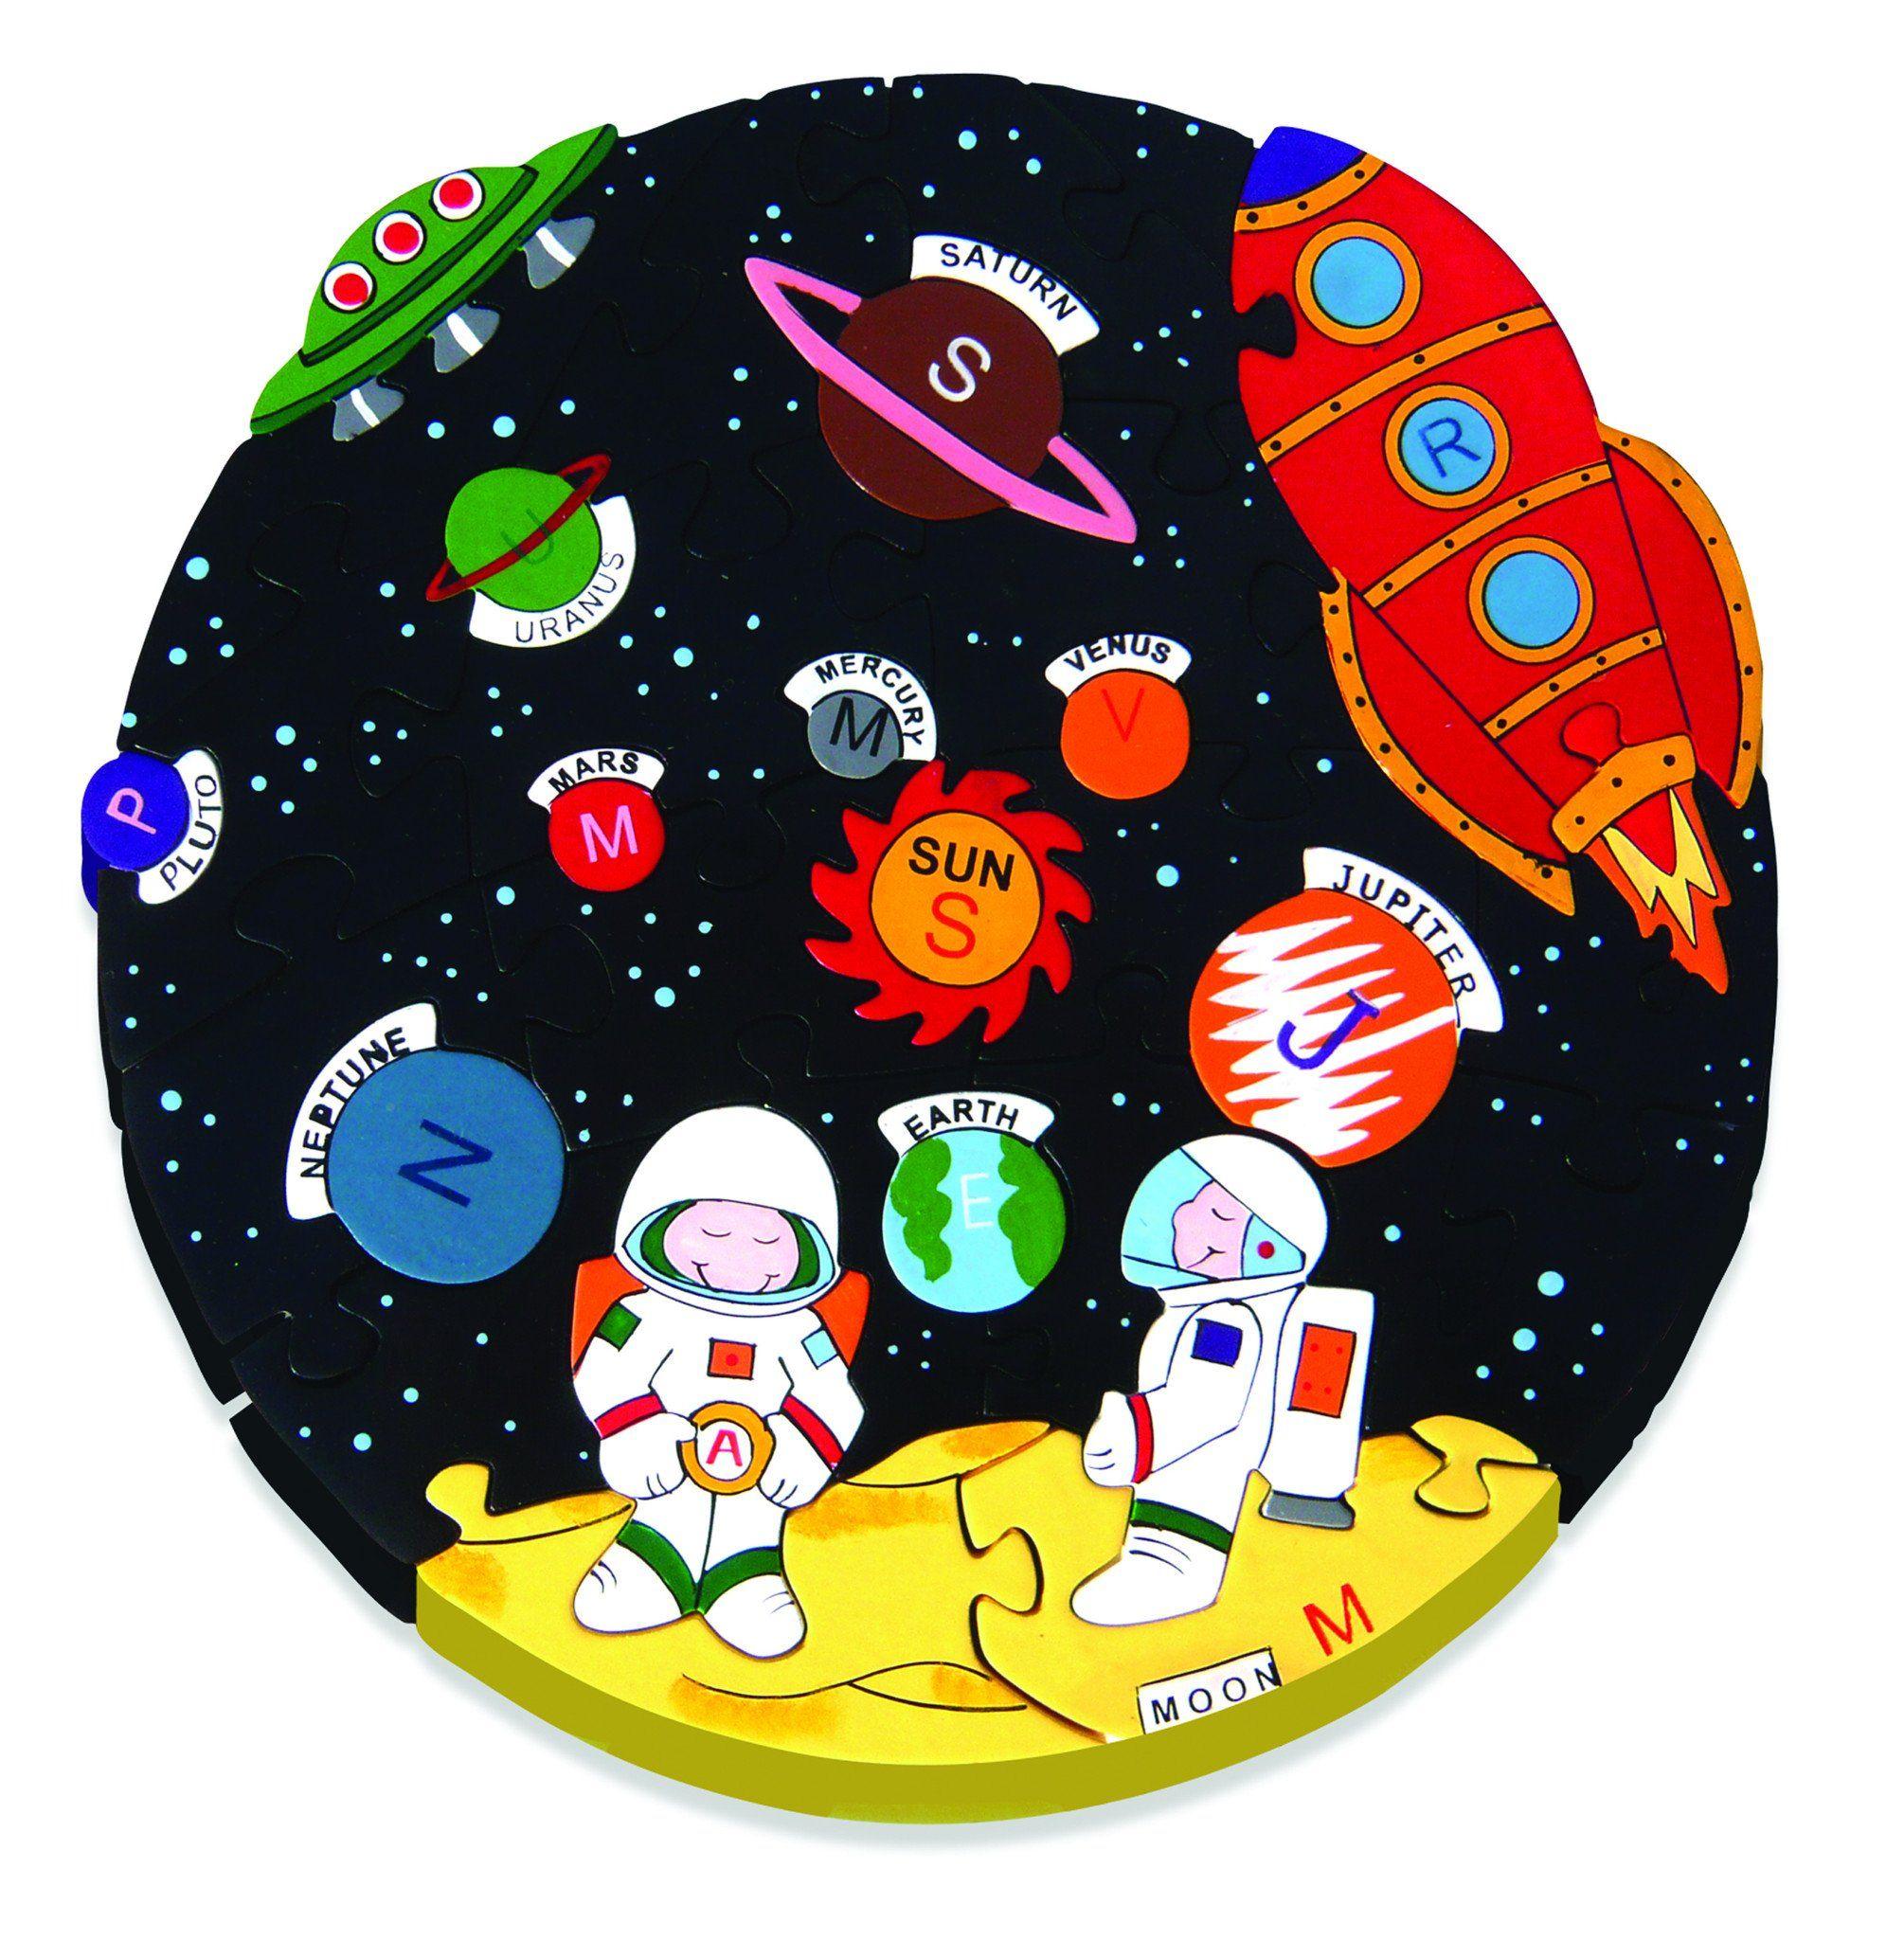 Solar System Jigsaw Puzzle Avec Images